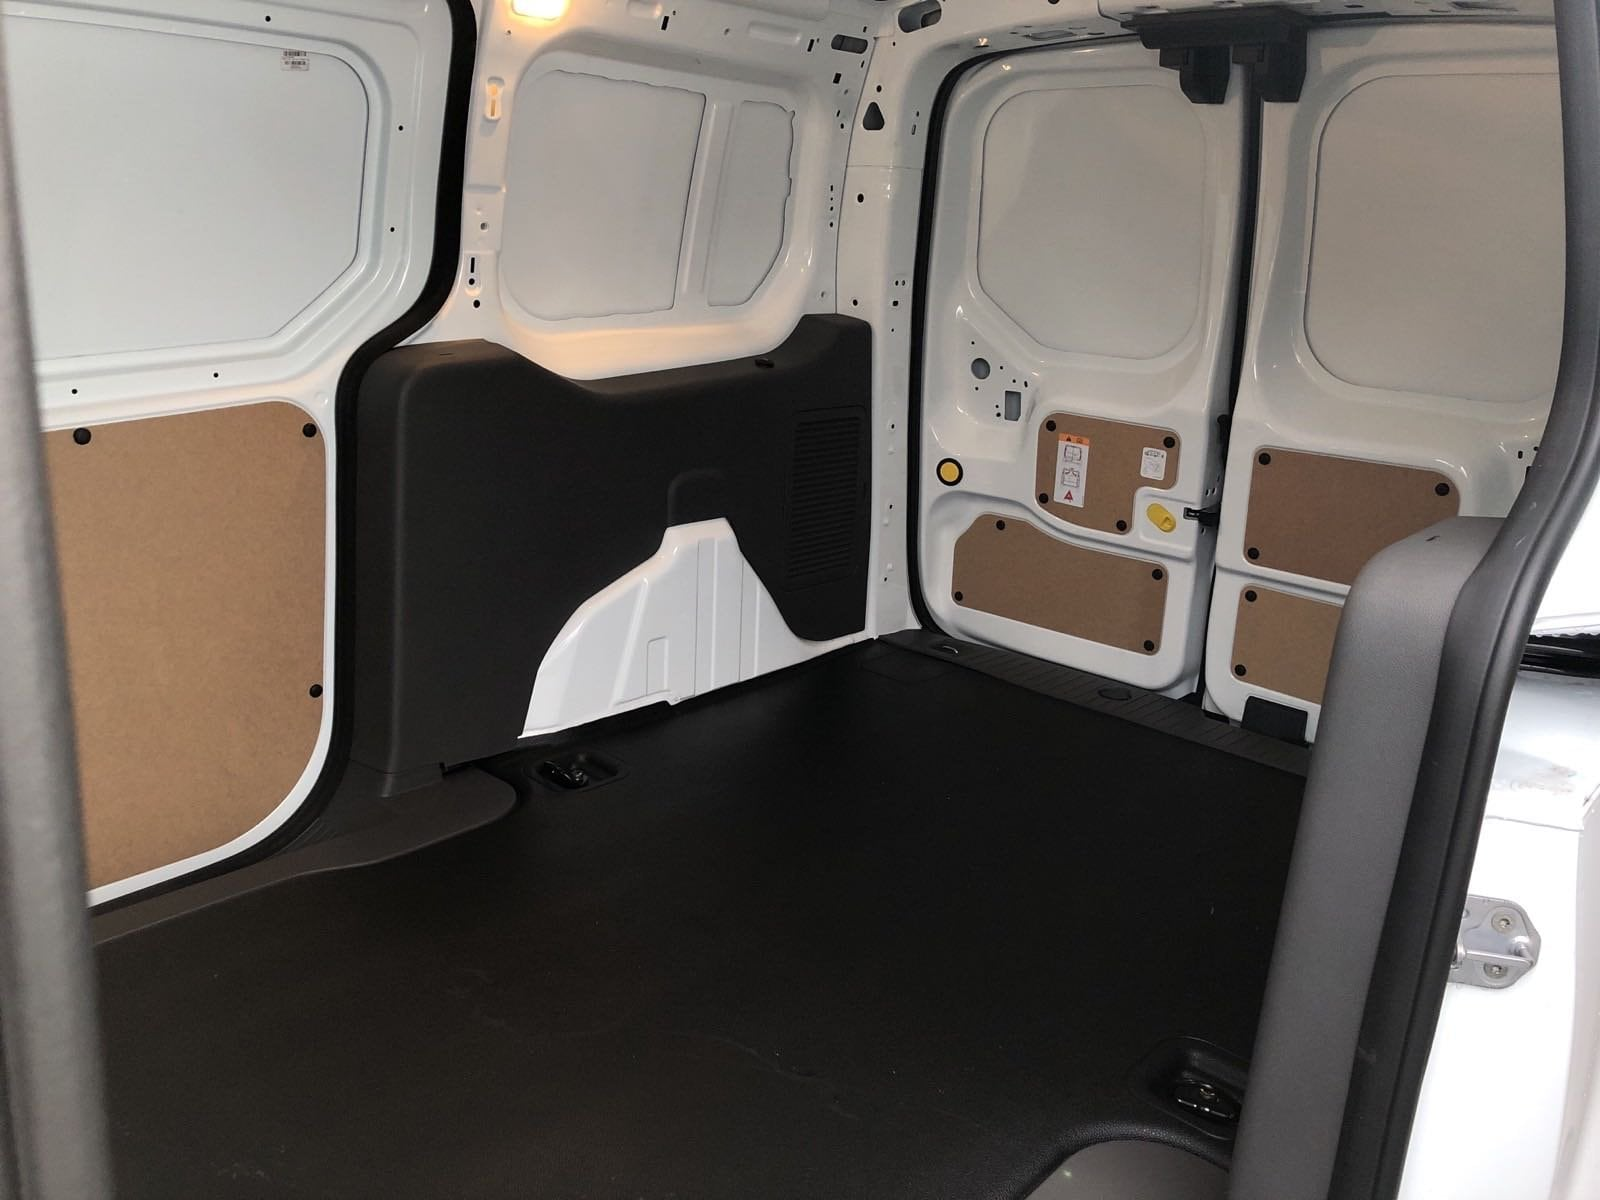 2020 Transit Connect, Empty Cargo Van #208512 - photo 1